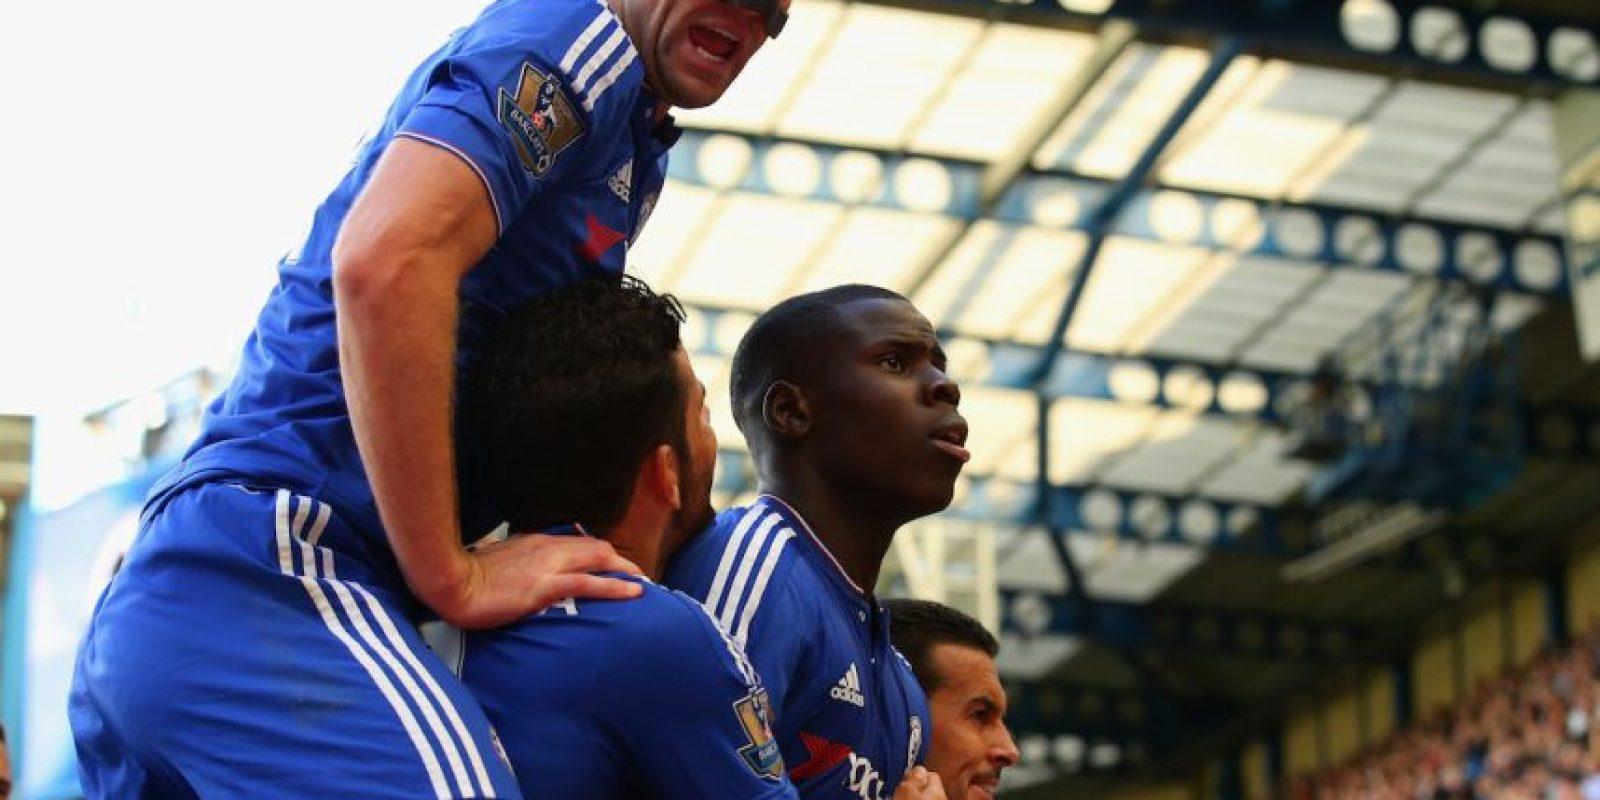 Kurt Zouma marcó el 1-0 sobre Arsenal, y a pocos minutos del final, Eden Hazard se encargó del 2-0 definitivo. Foto:Getty Images